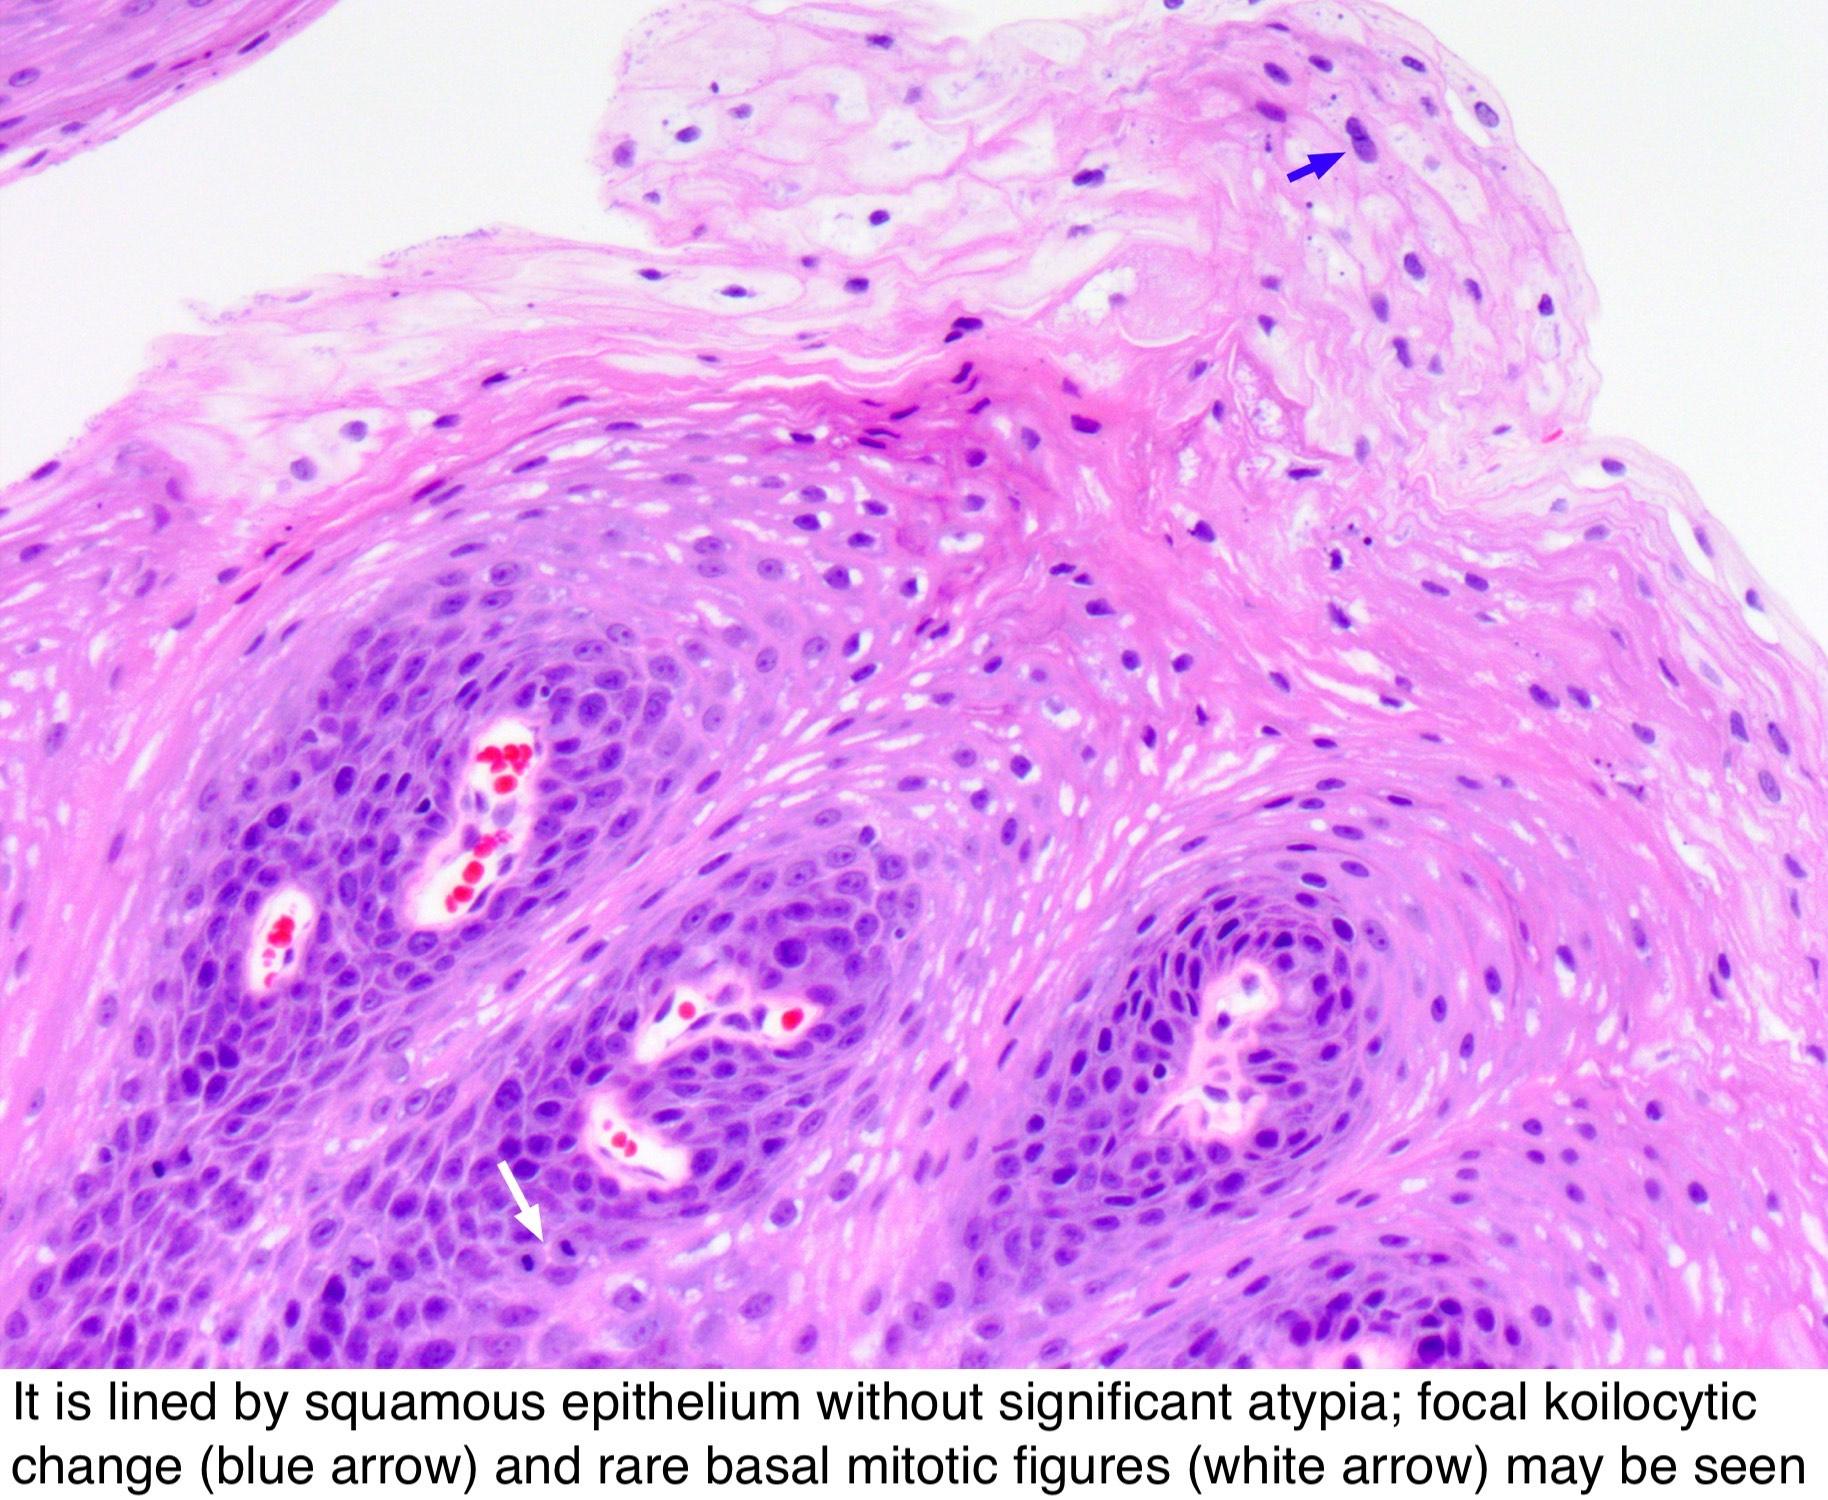 Squamous papilloma esophagus pathology - thecroppers.ro